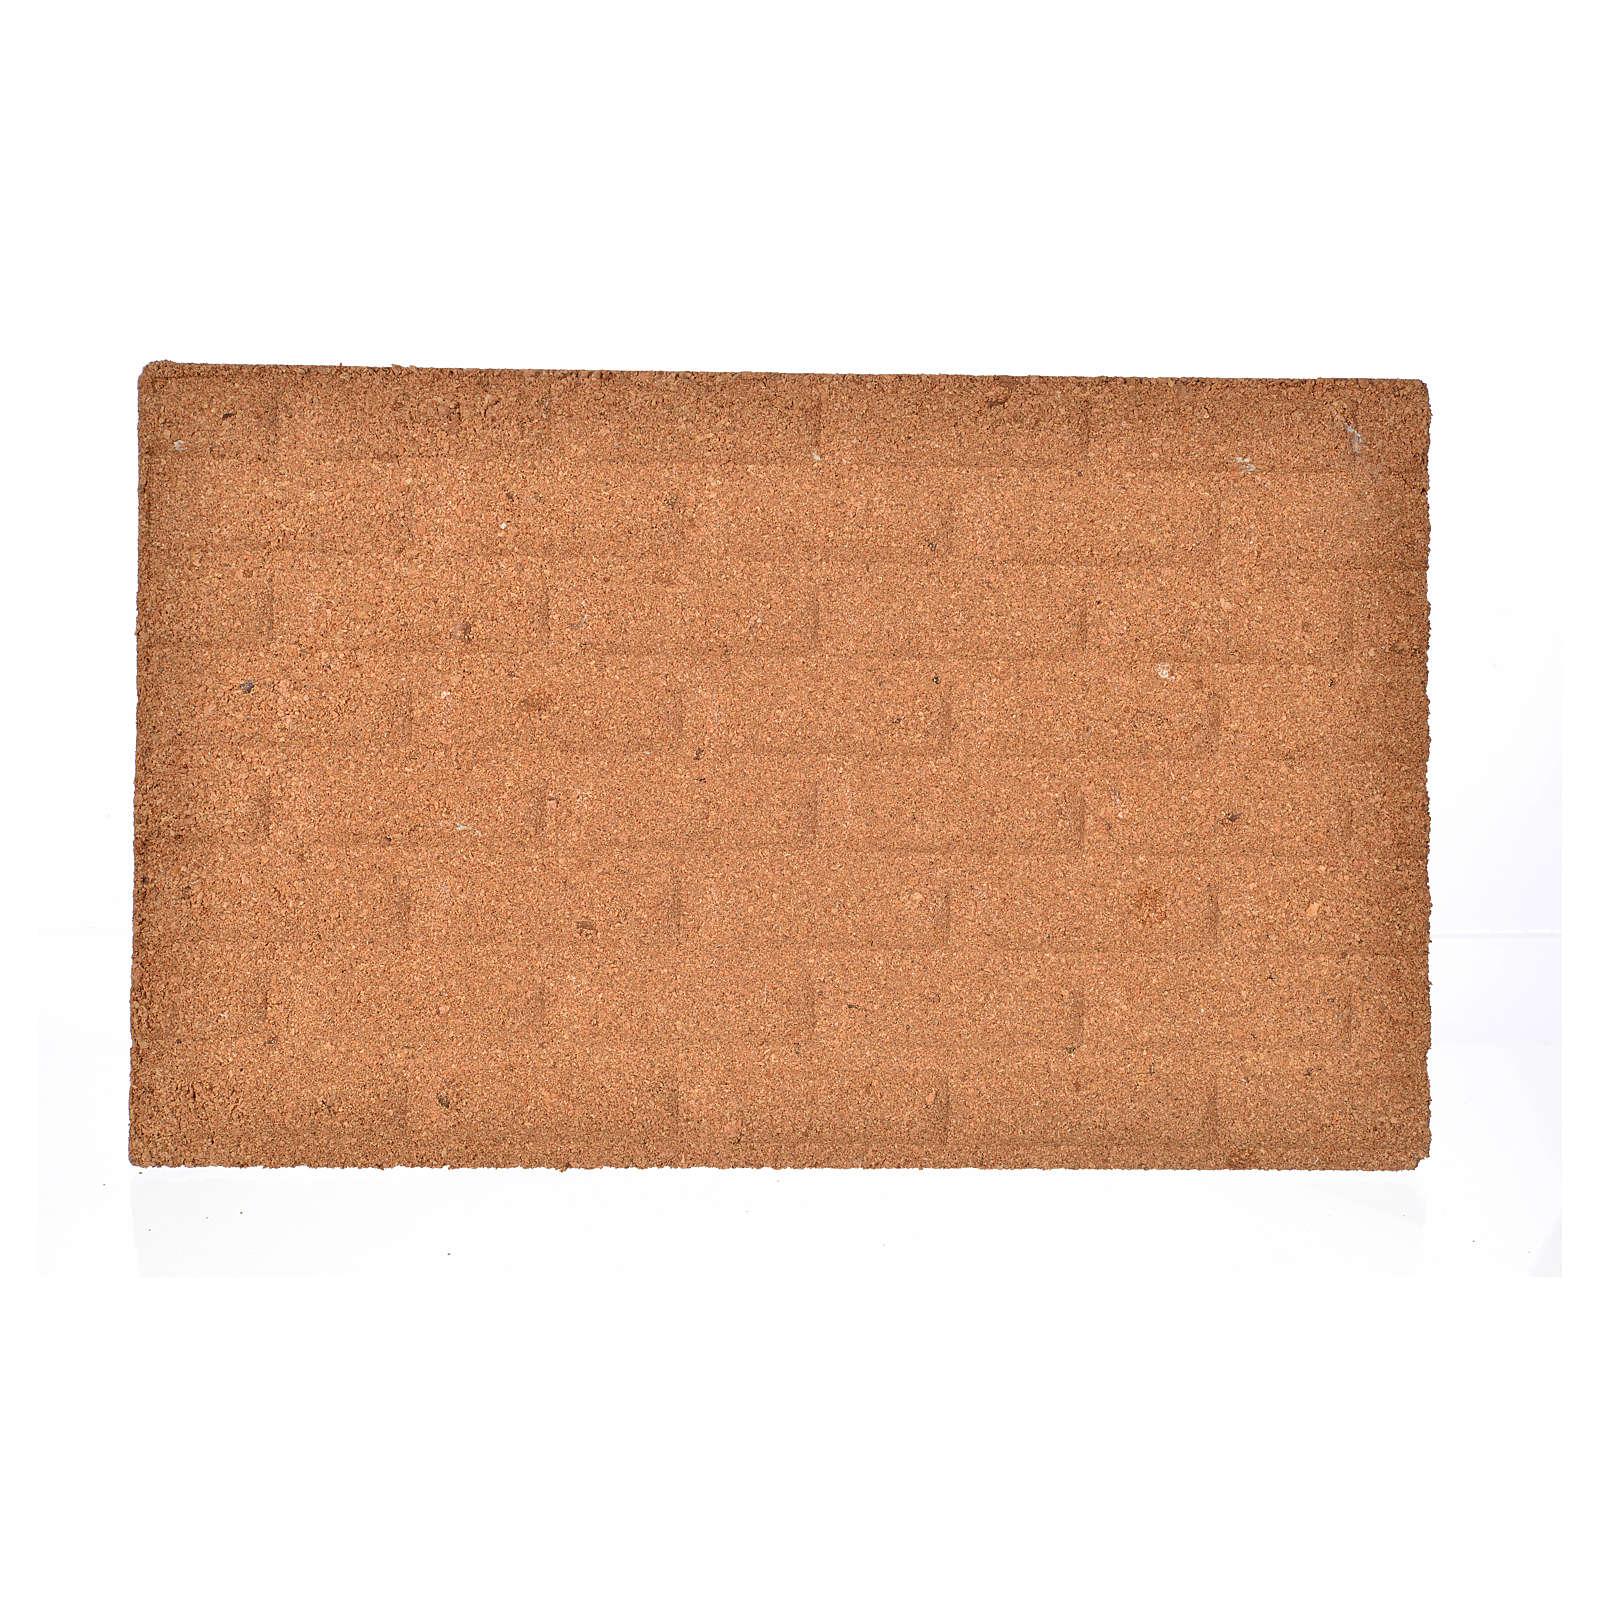 Plancha corcho muro ladrillos grandes cm. 33x20x1 4